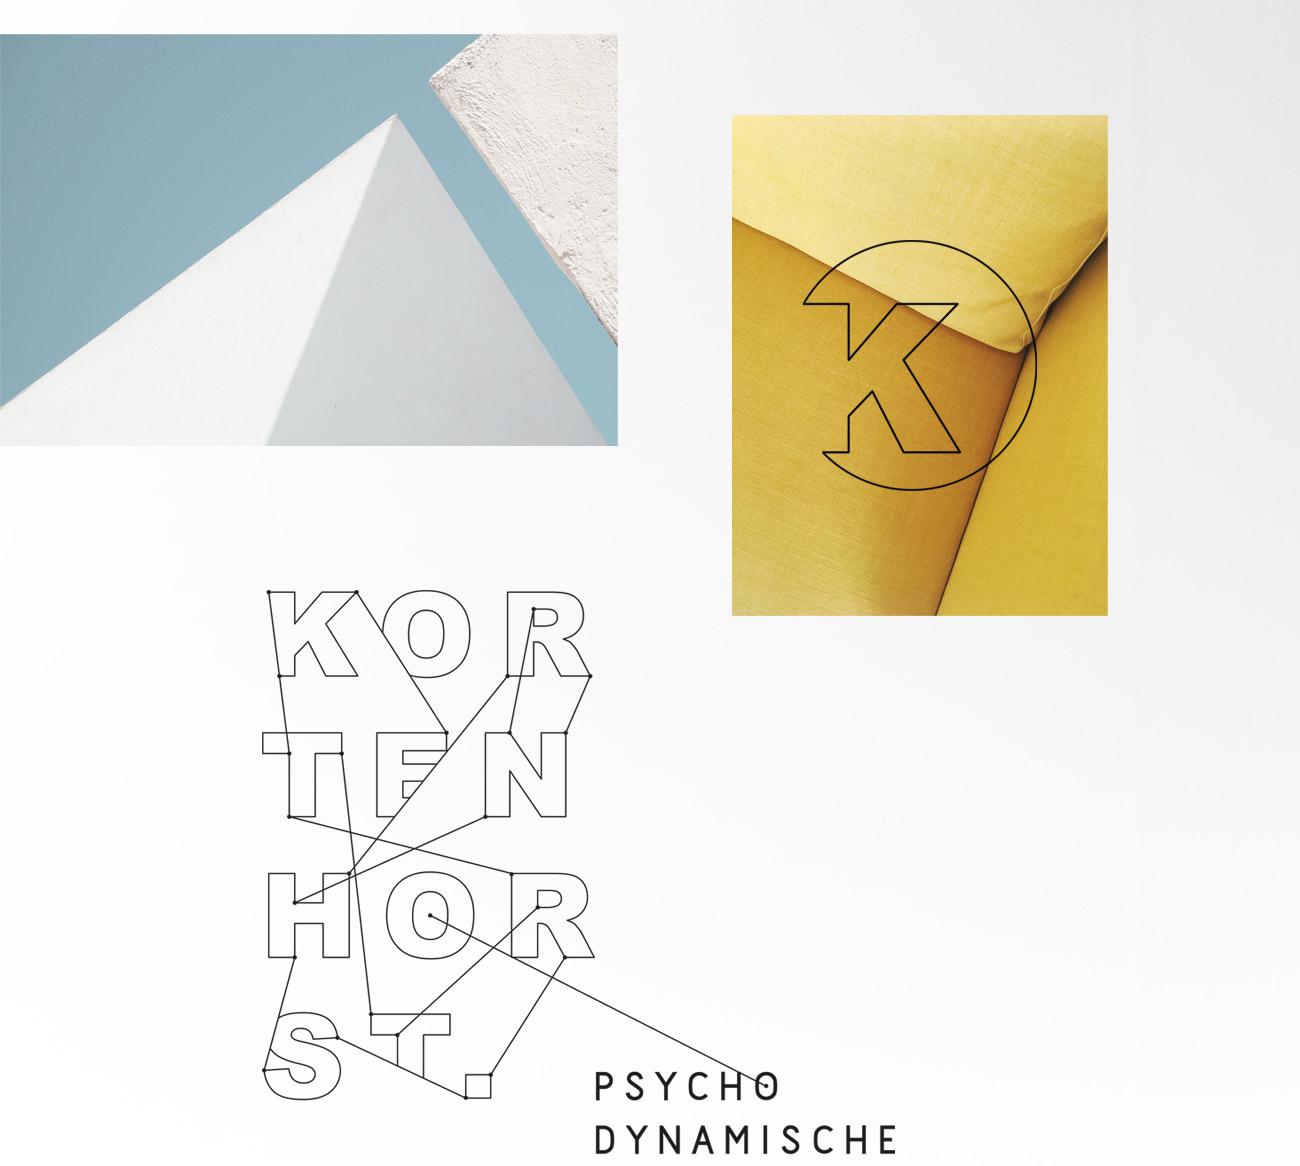 logo design branding and visual identity for Lisa Kortenhorst design by Poppyonto